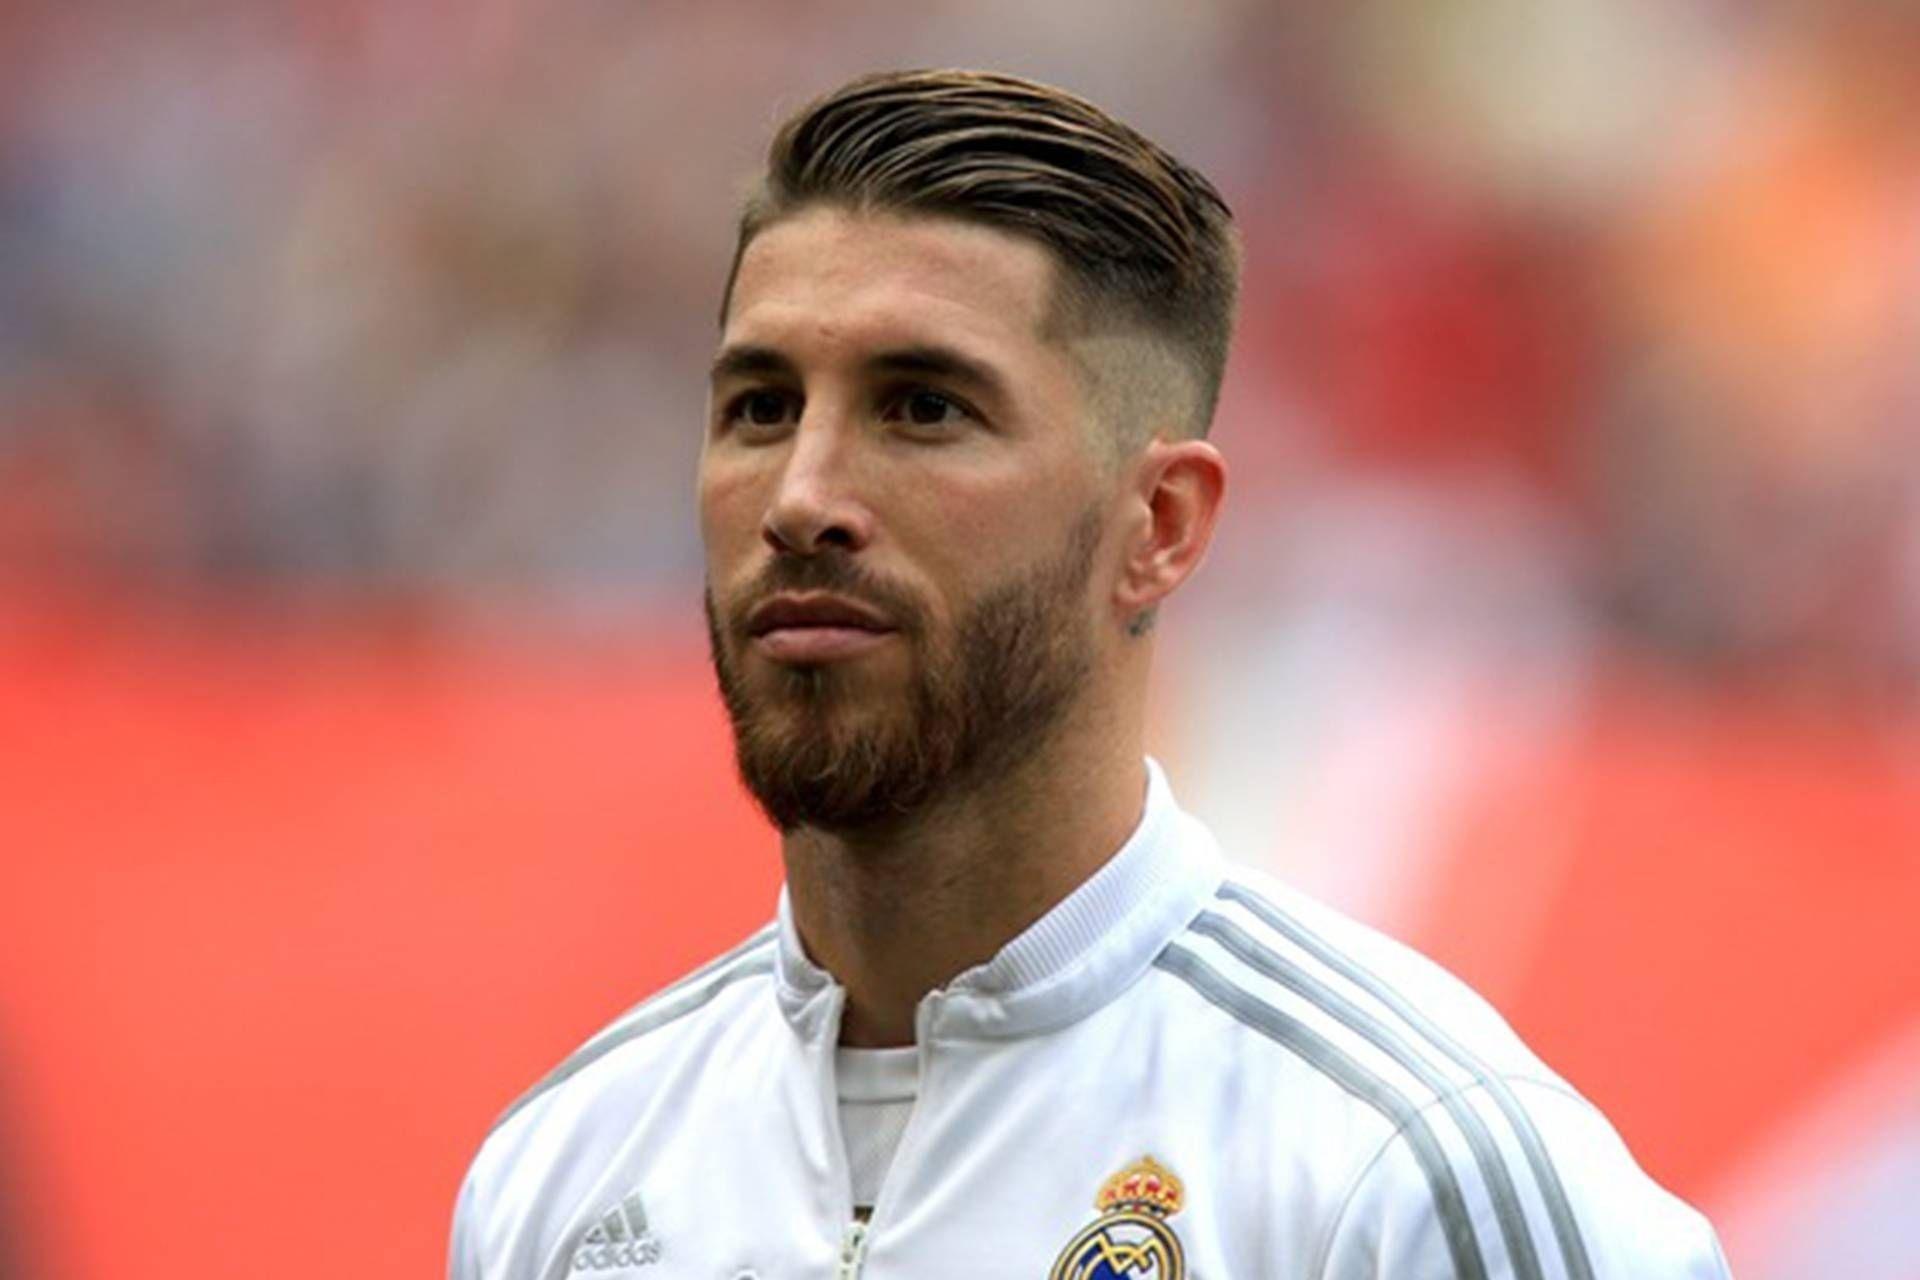 Sergio Ramos Haircut   Style   Pinterest   Ramos Haircut, Haircuts inside Ramos Haircut 2018 Champions League